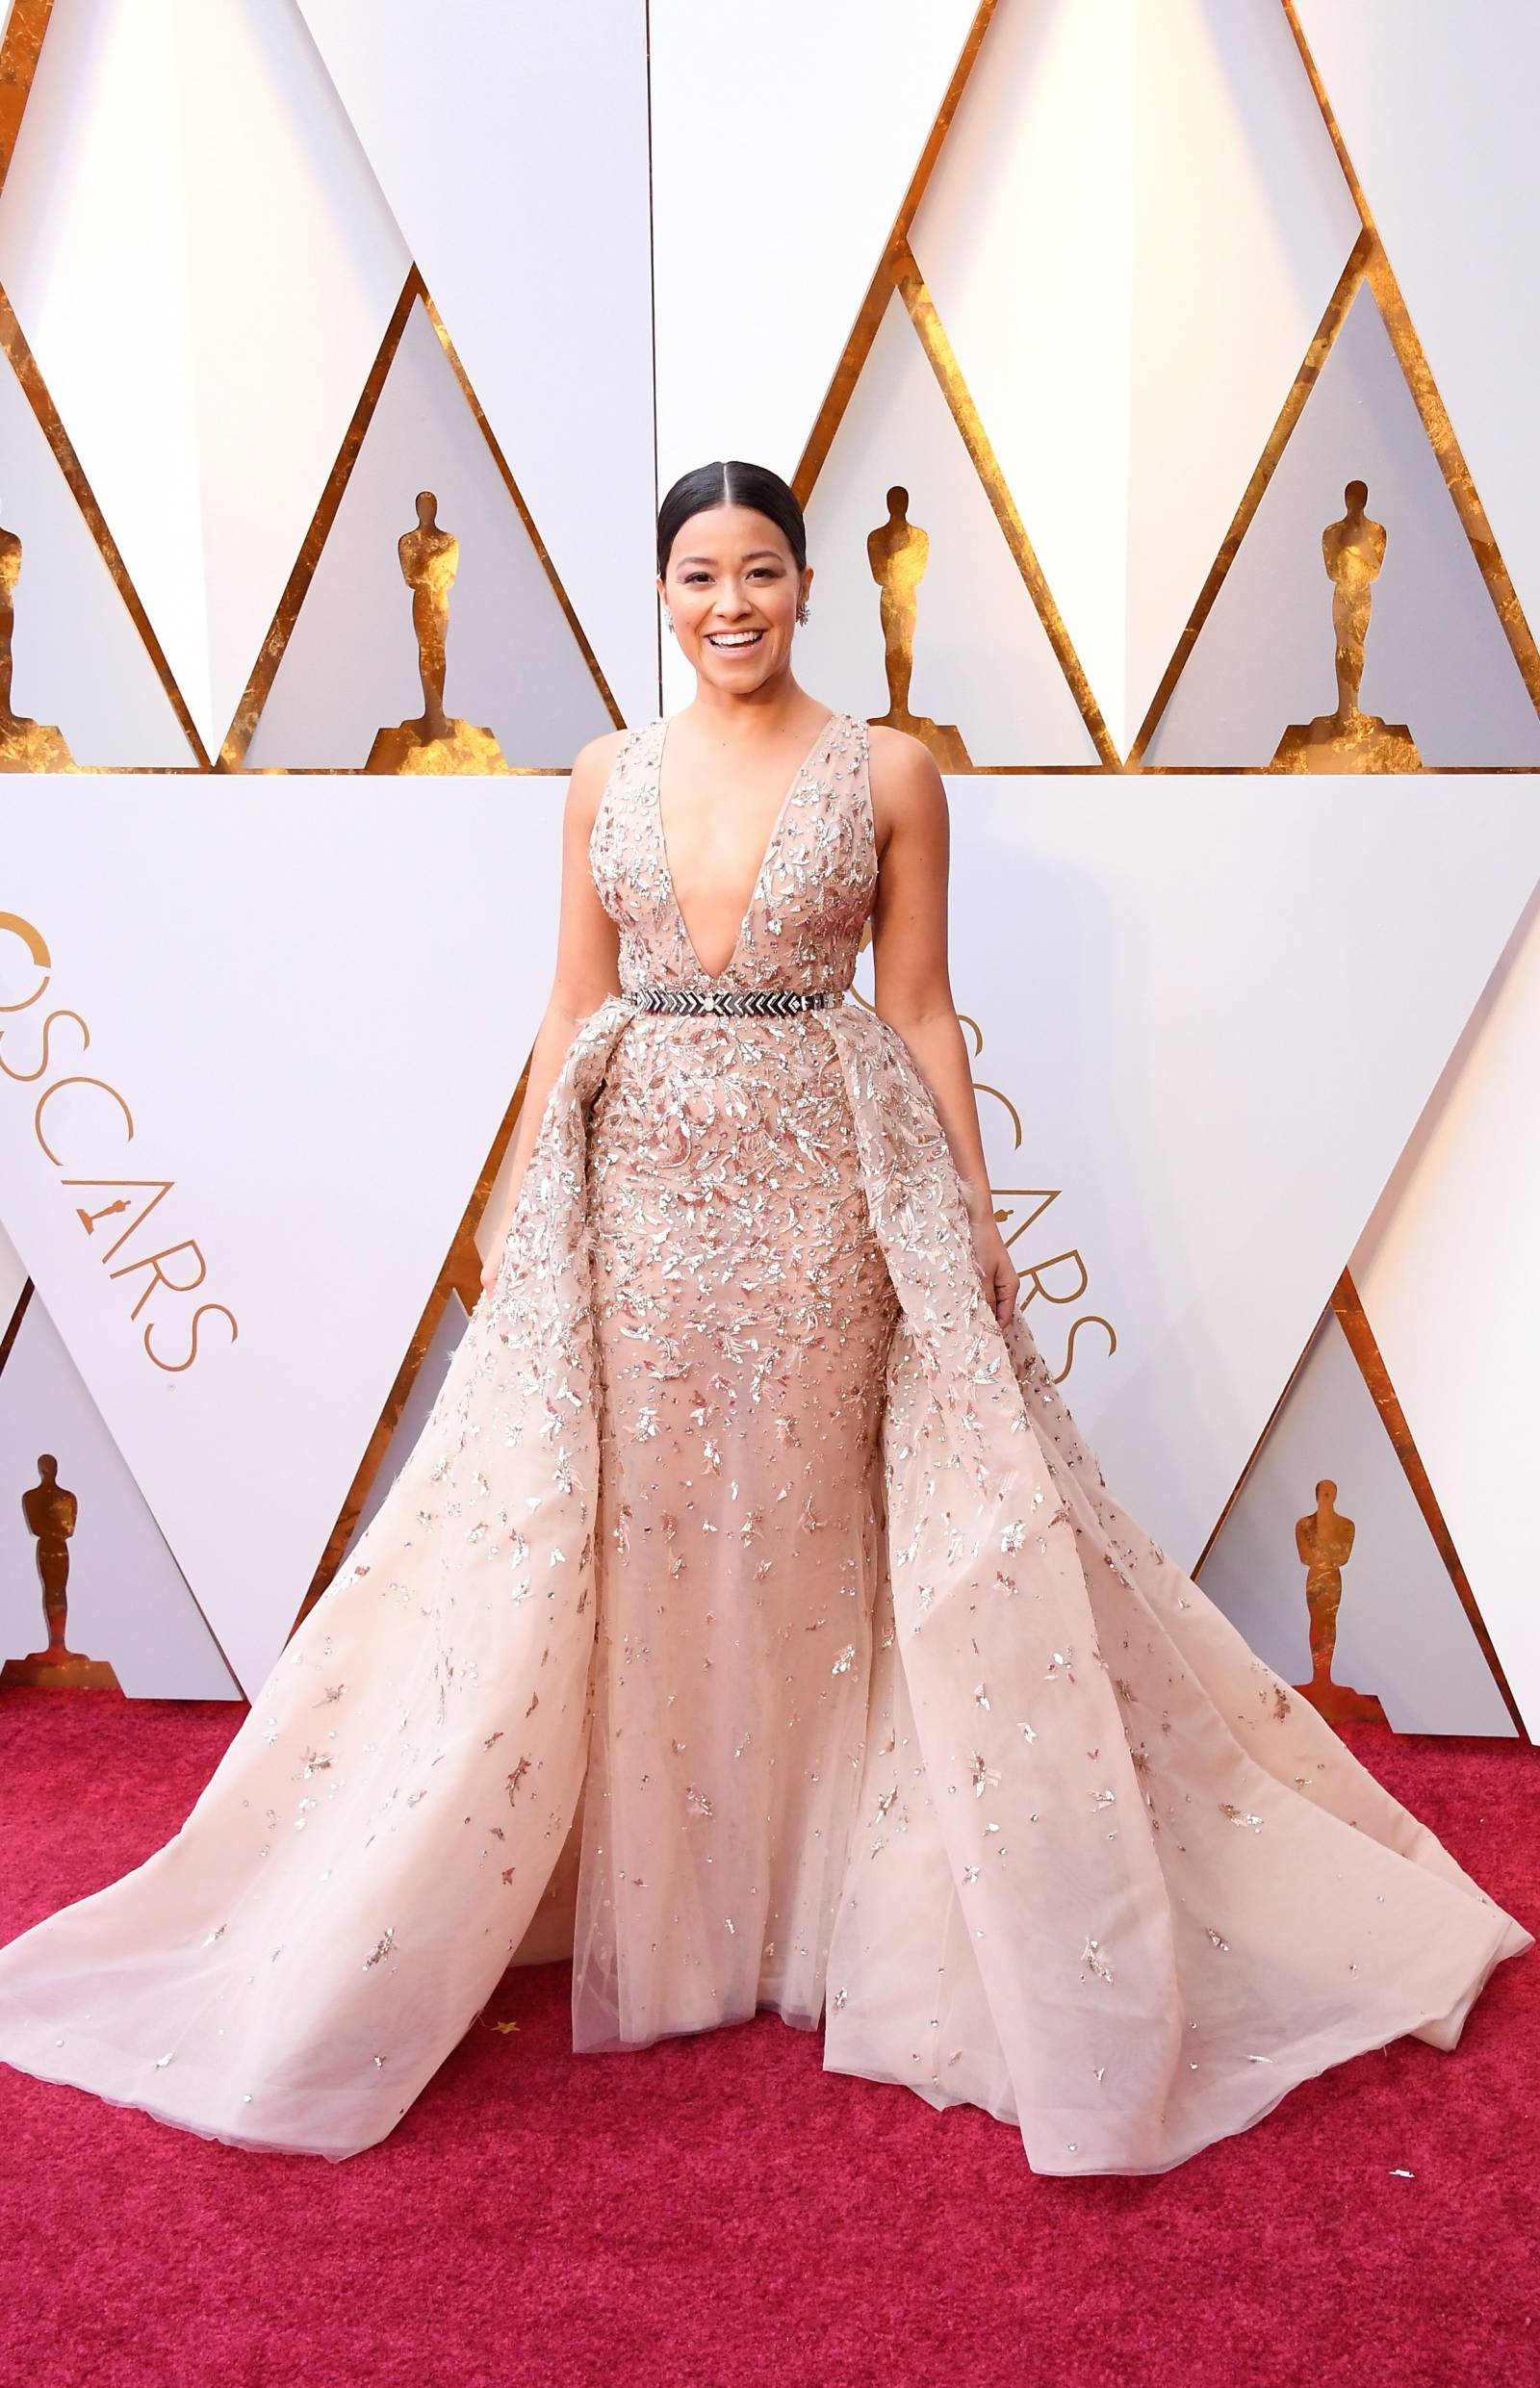 Oscars 2018 Fashion Roundup: Our Favorite Wedding Worthy Looks | Los ...